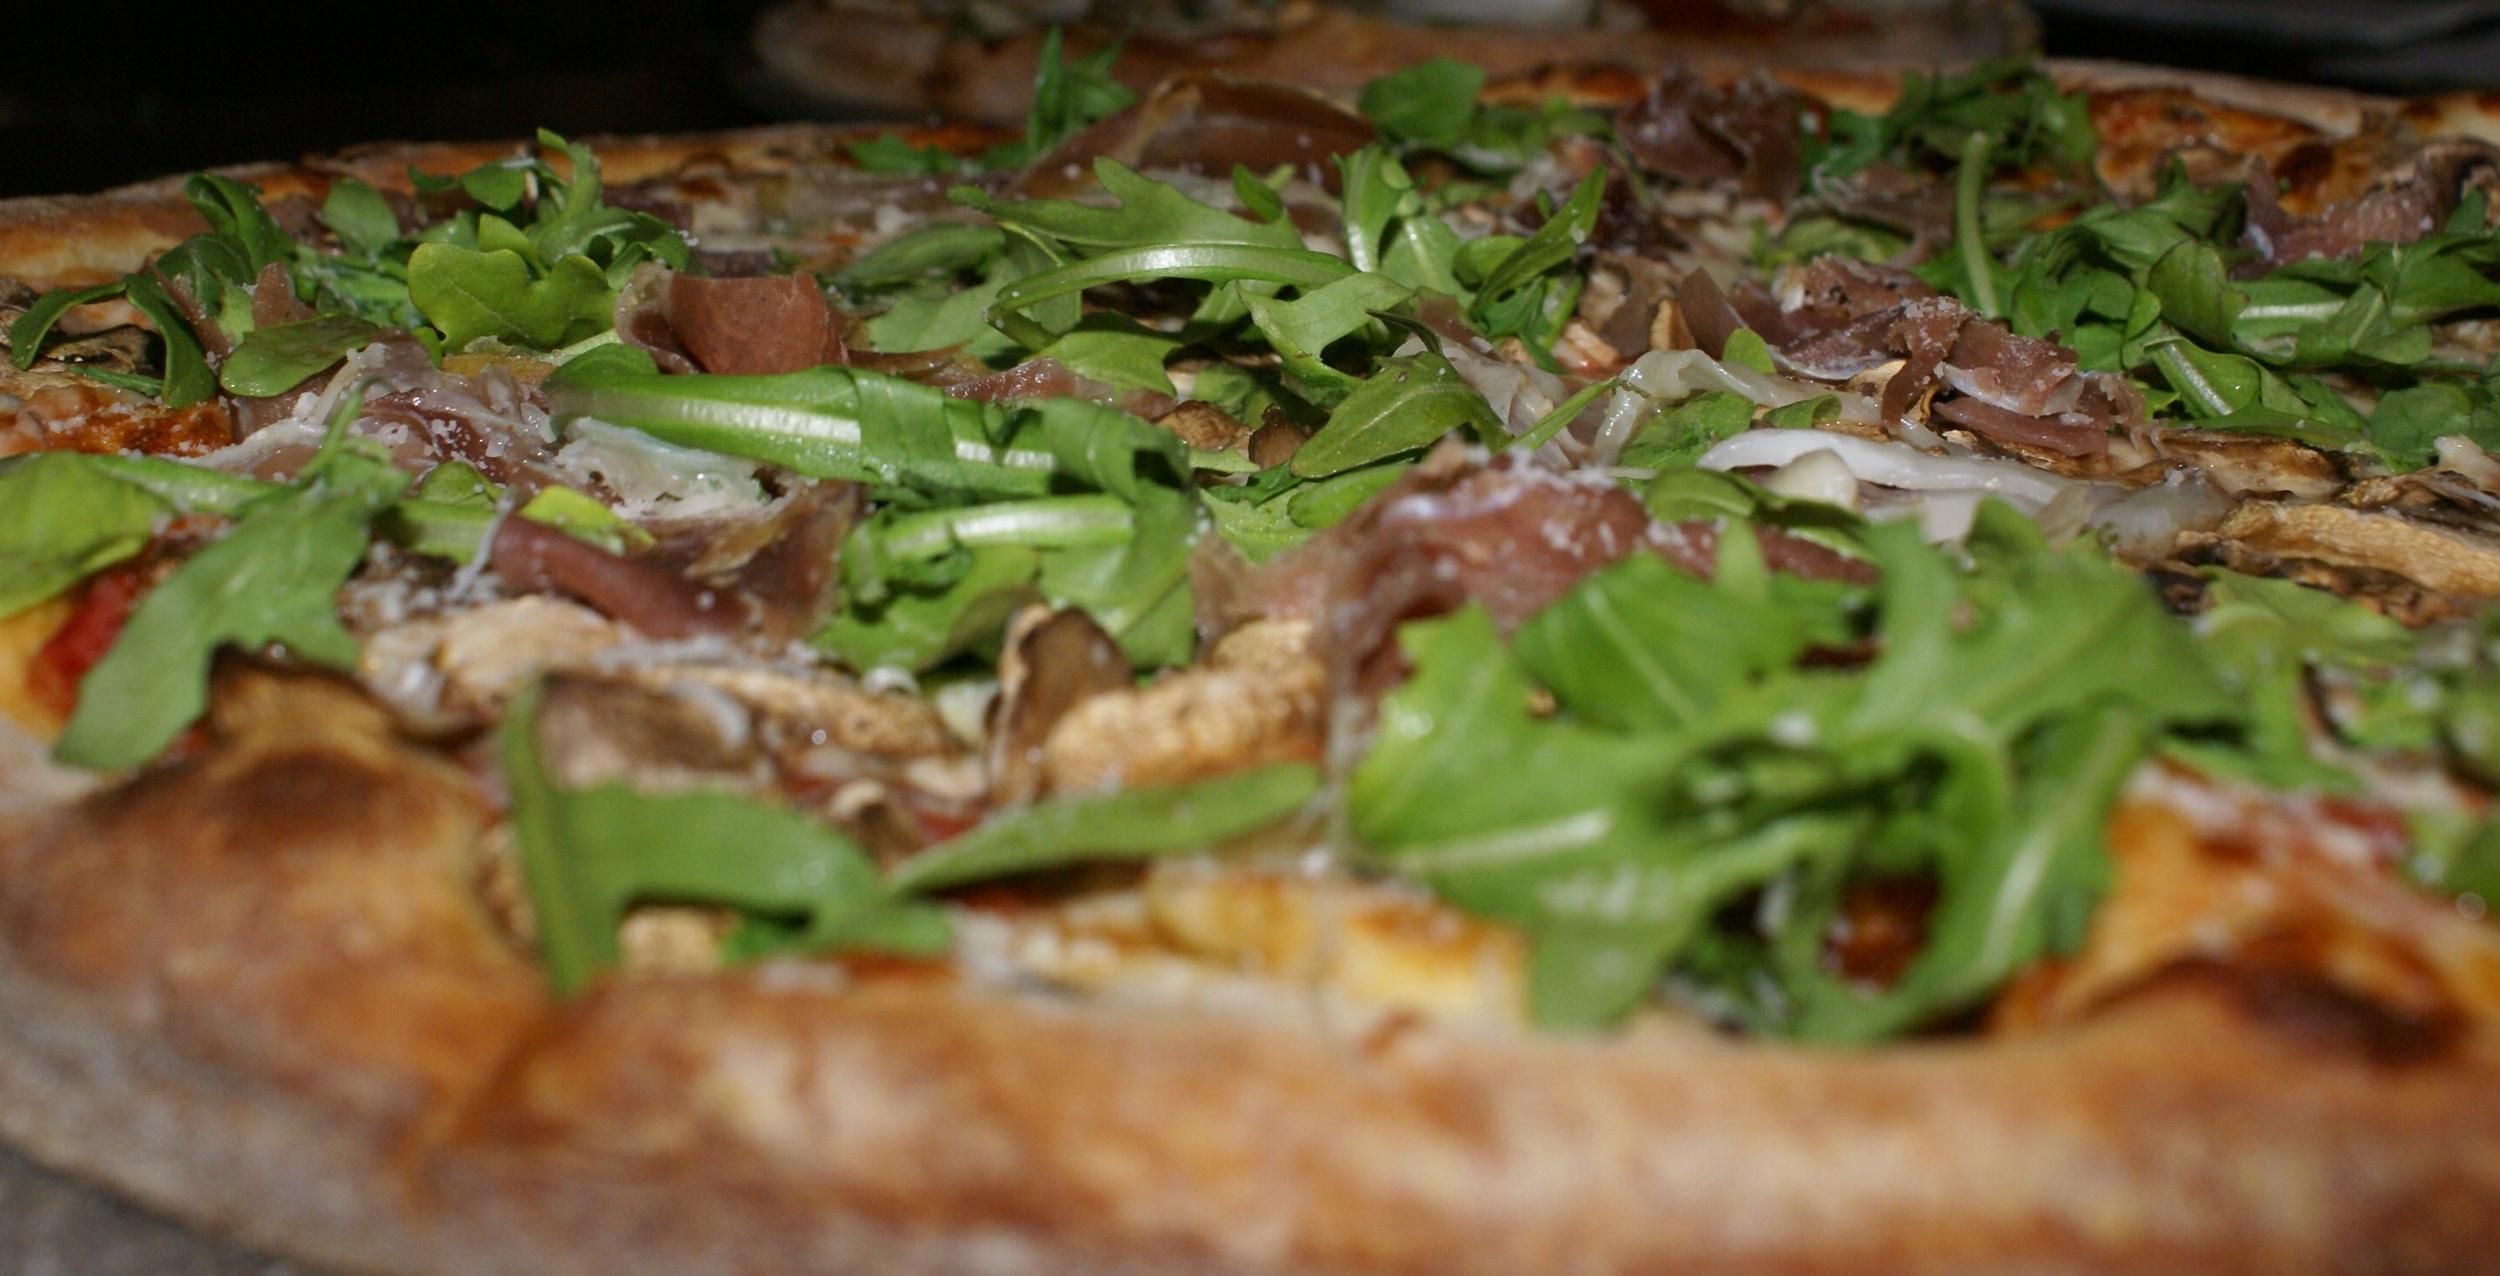 GiGi's Pizza - prosciutto, mushroom, arugula, parmesan